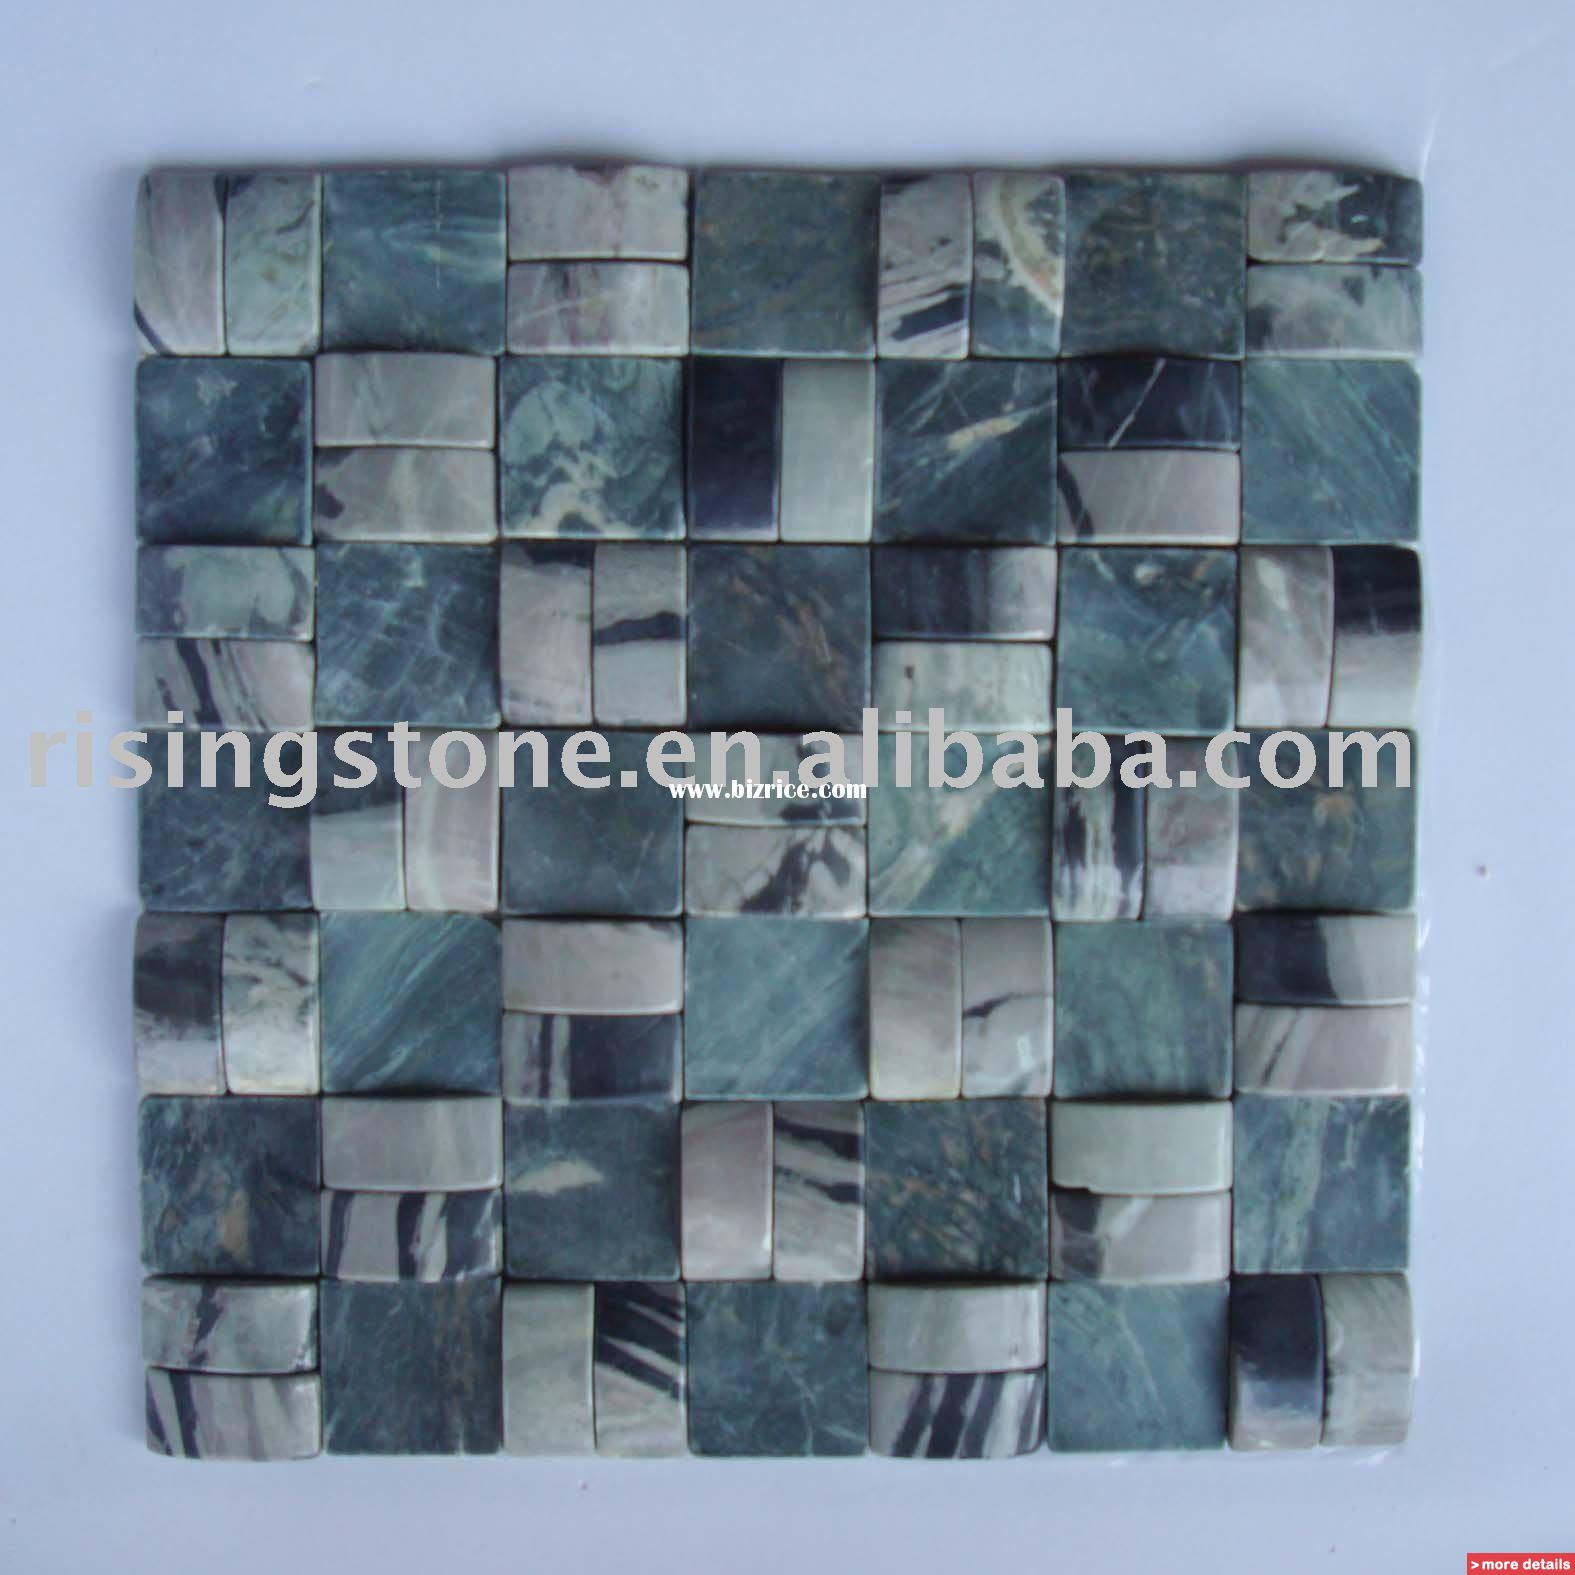 glass_mosaic_bathroom_tile